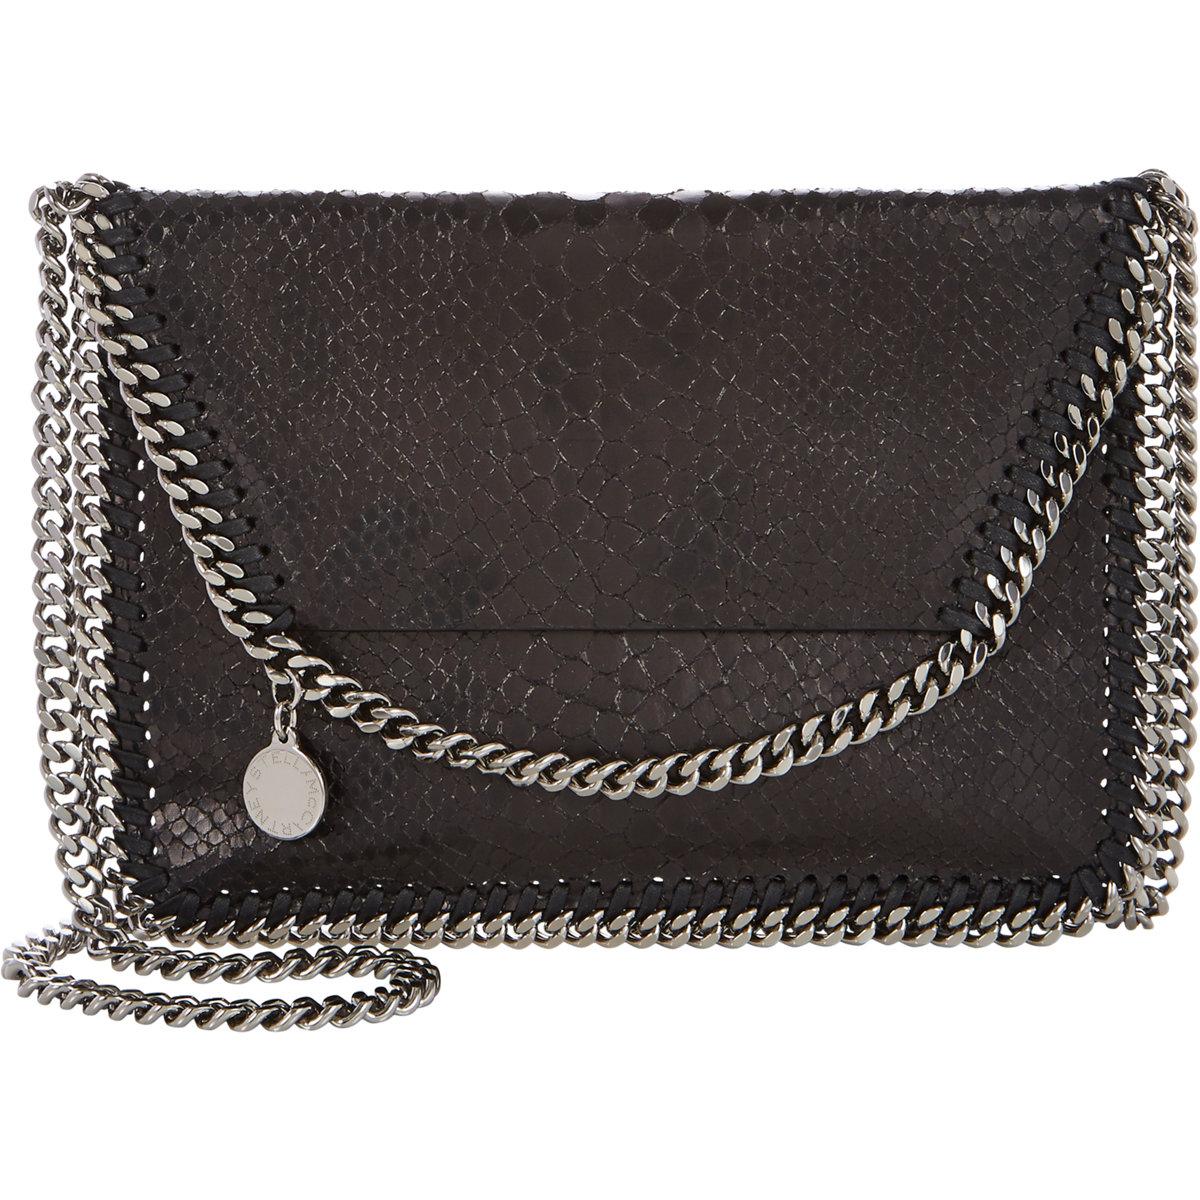 8d68c84ea7e0 Gallery. Previously sold at  Barneys New York · Women s Stella Mccartney  Falabella Women s Logo Bags ...